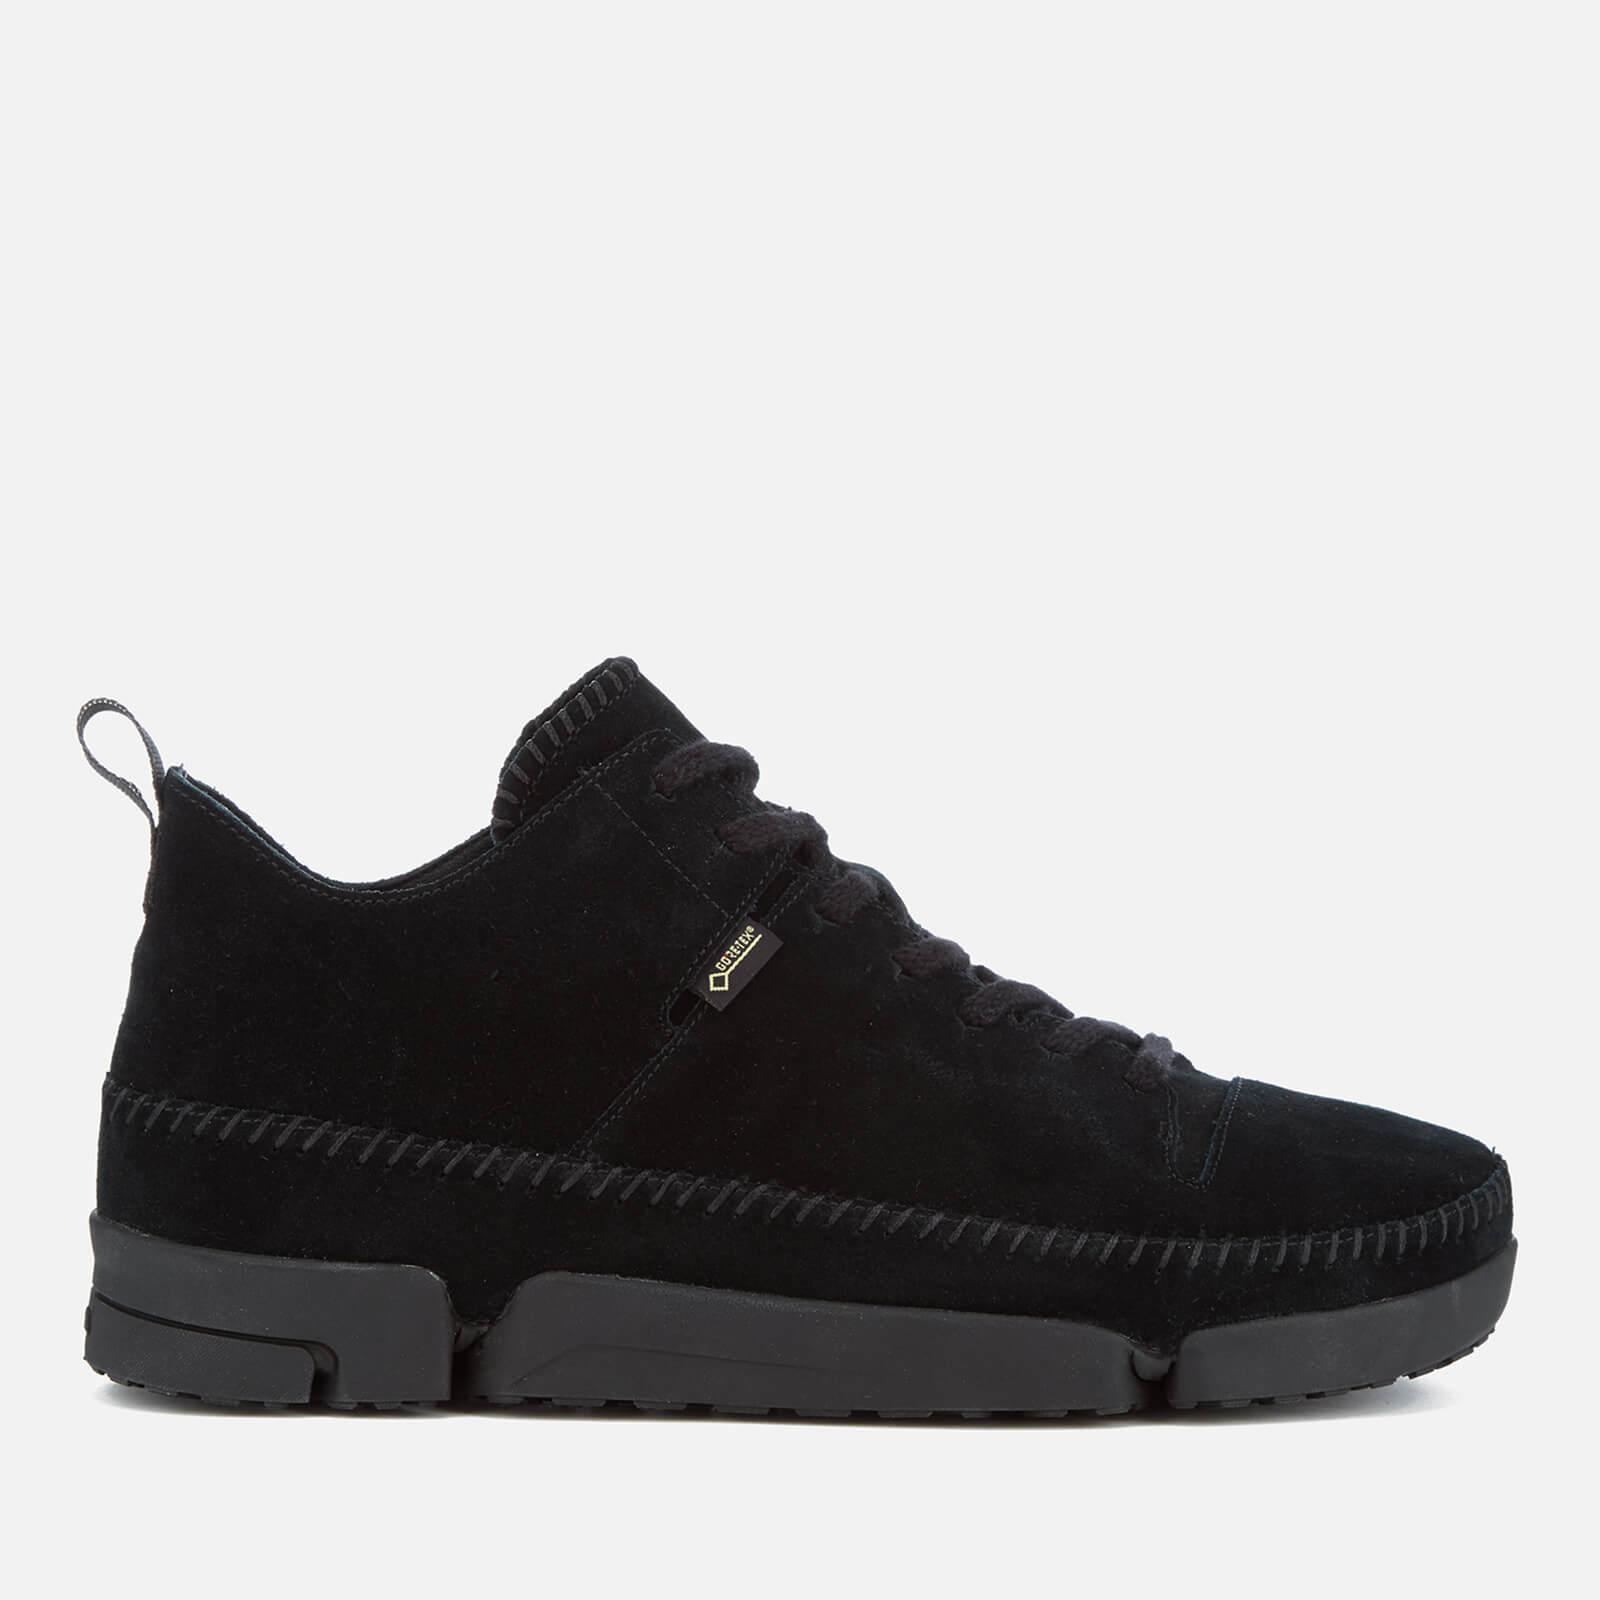 hot product classic shoes great deals on fashion Clarks Originals Men's Trigenic Dry Gore-Tex Shoes - Black Suede